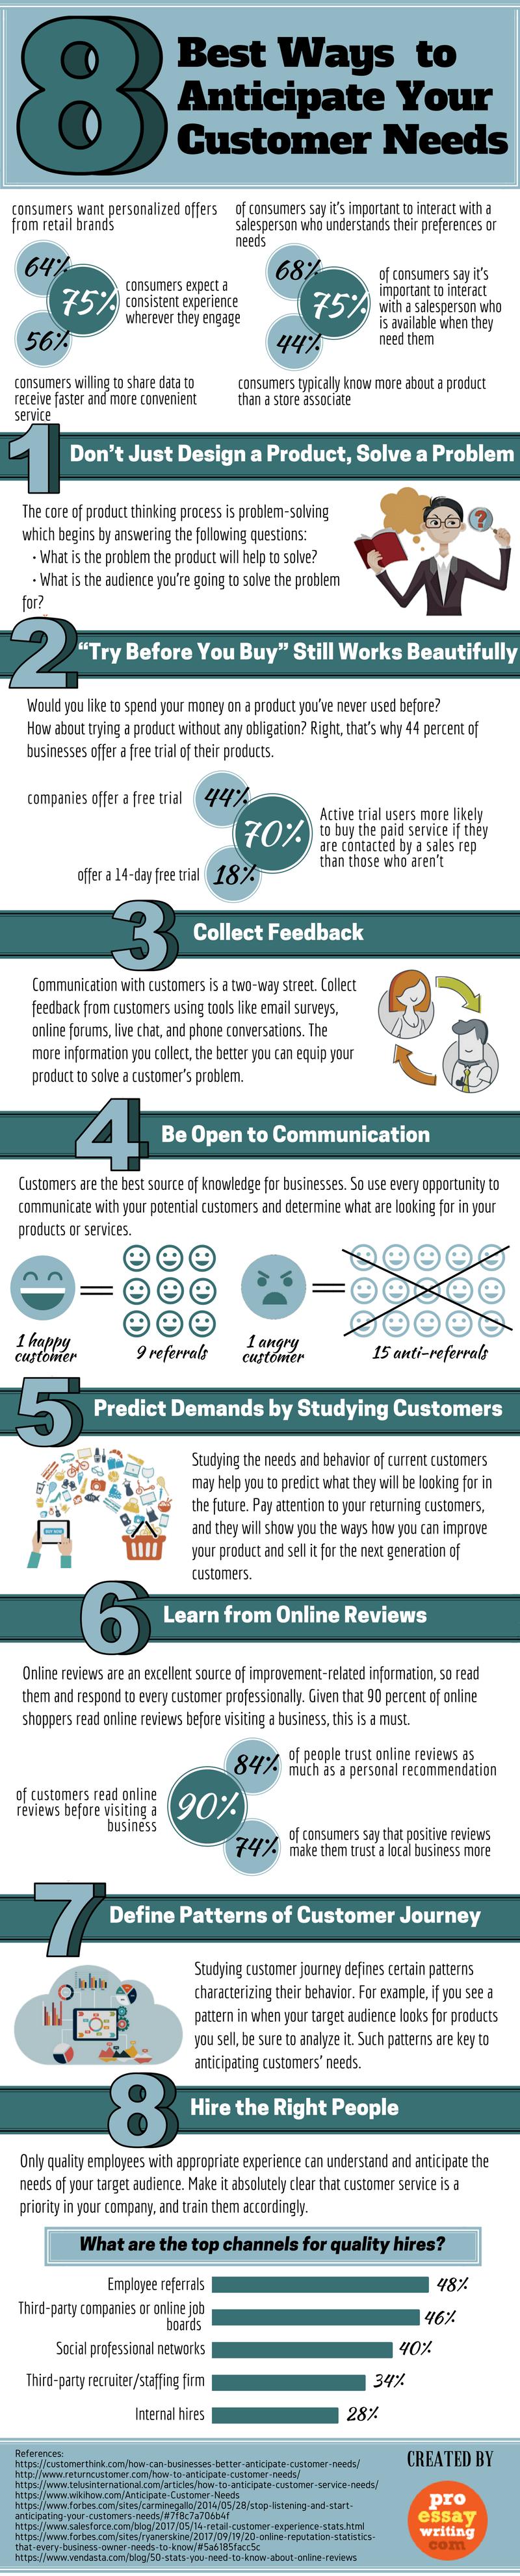 Best Ways to Anticipate Customer Needs -Infographic Image